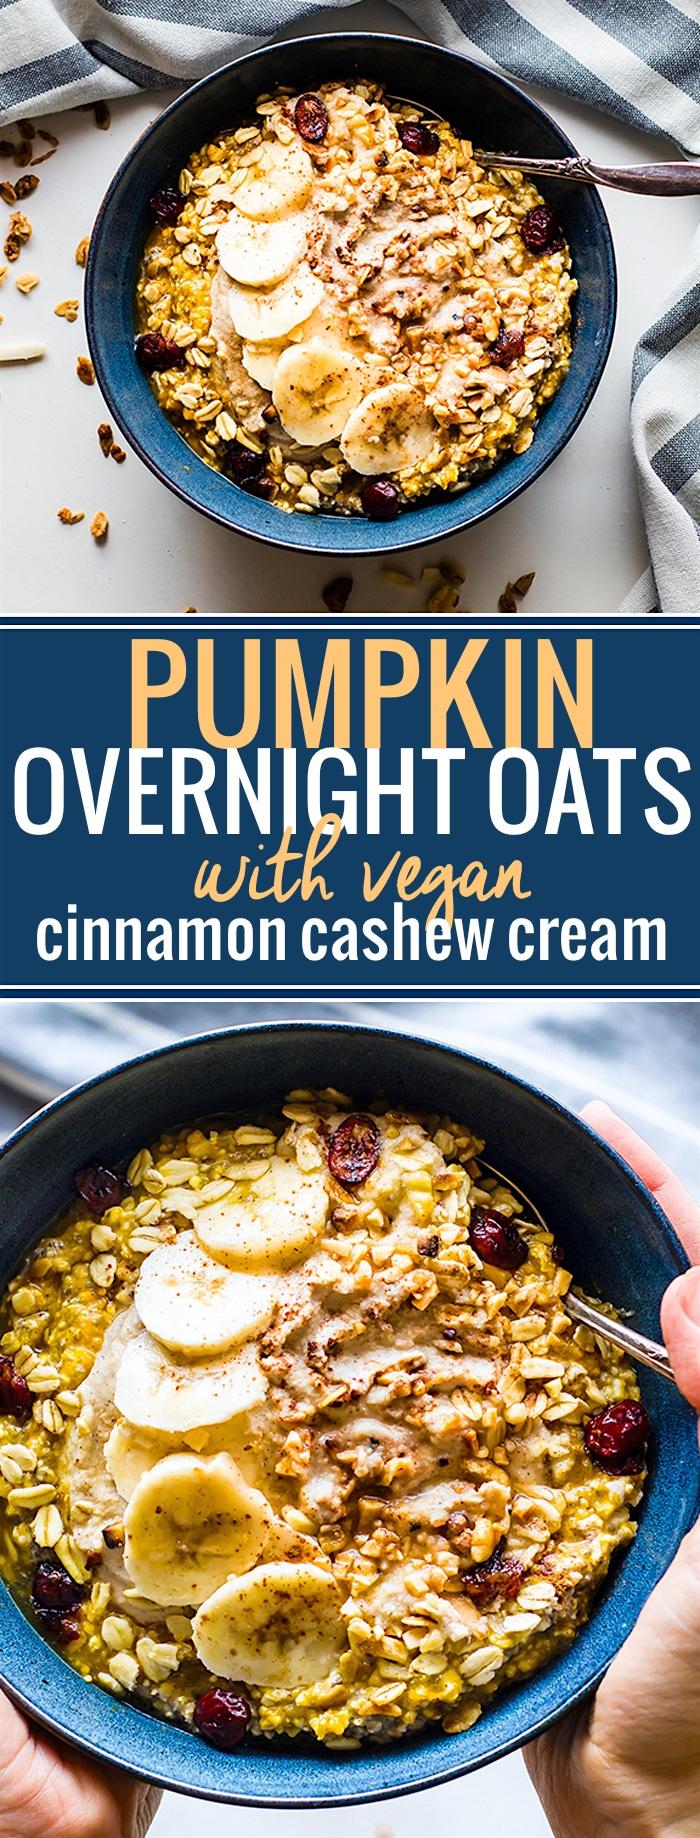 Pumpkin Overnight Oats with Cinnamon Cashew Cream and cranberry nut topping! A vegan pumpkin overnight oats recipe for Fall breakfasts. Gluten free, easy. @cottercrunch